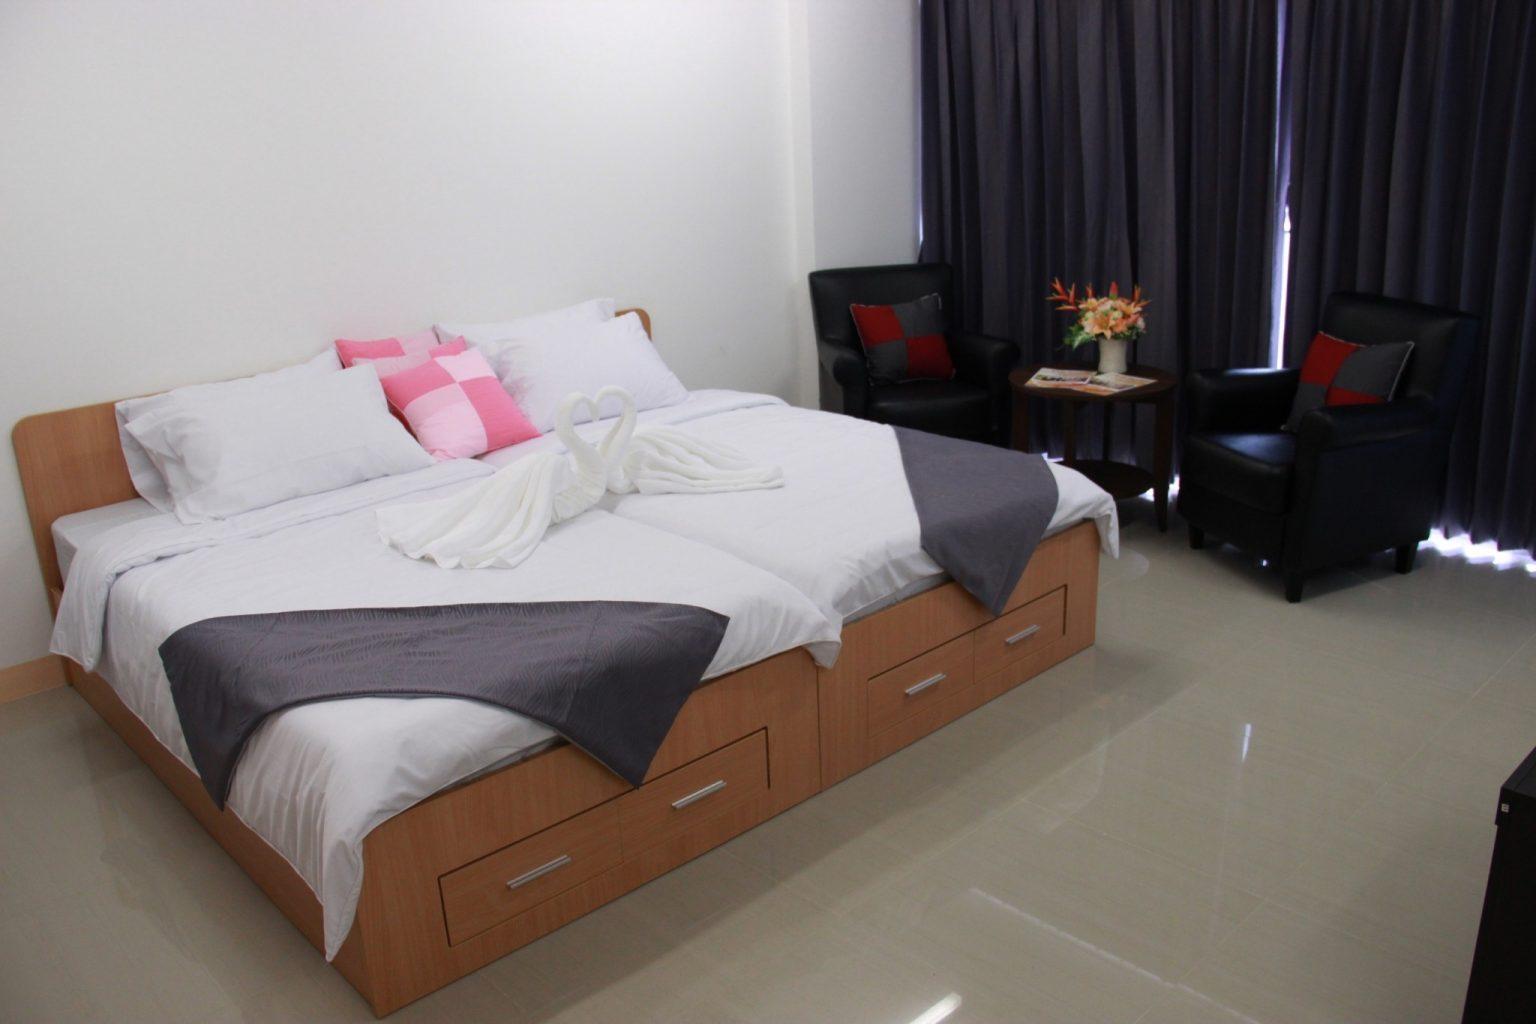 buuic facilities_201226_3